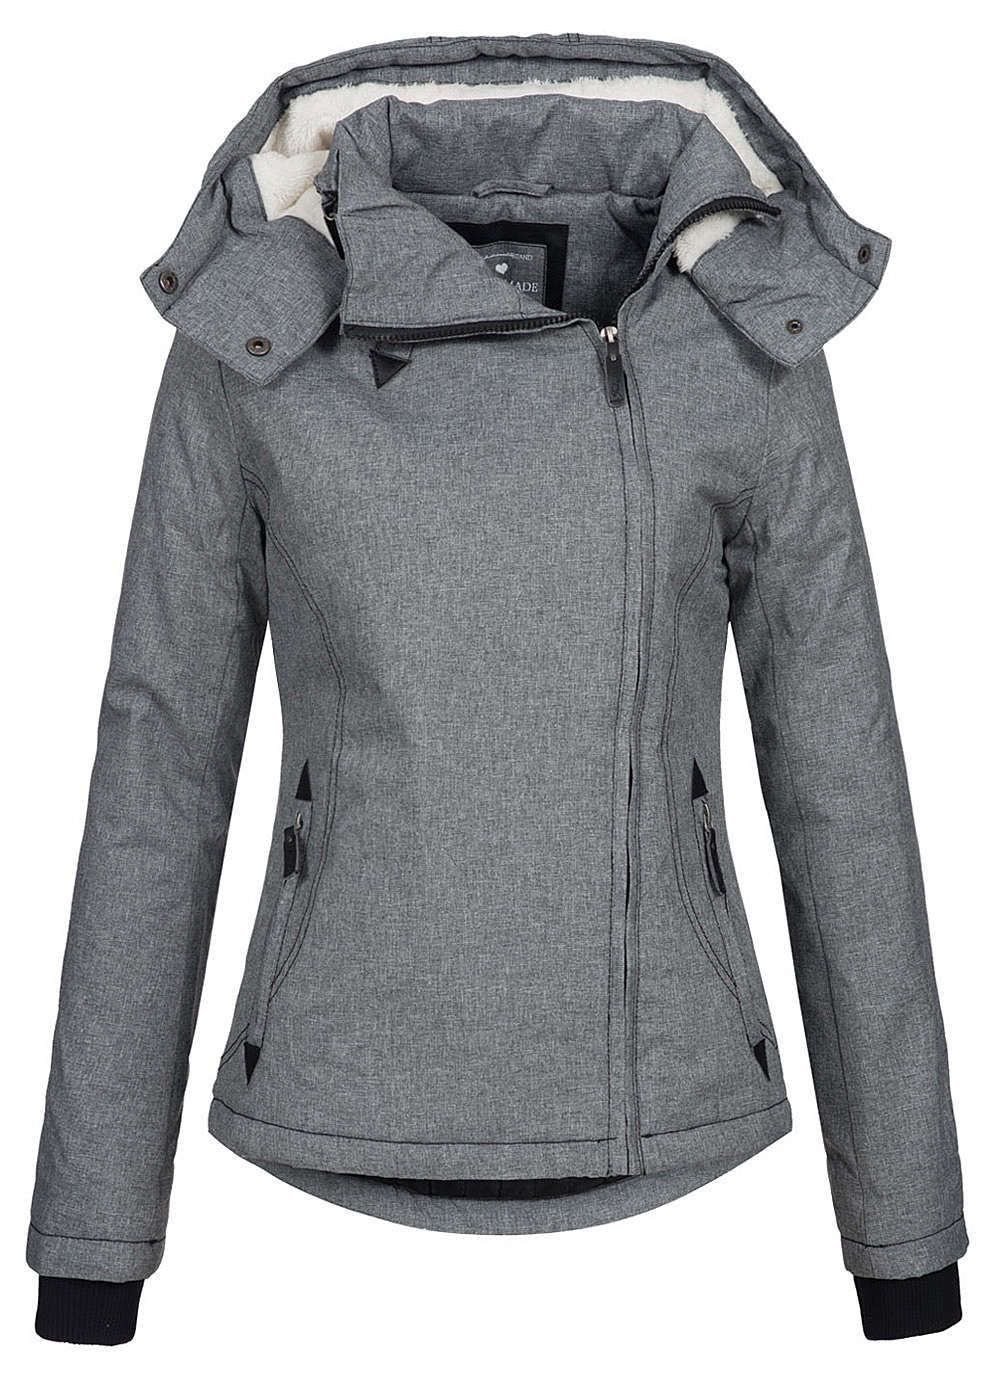 Eight2Nine Damen Winter Jacke wasserabweisend asym Zipper by Fresh Made  dunkel grau mel - 77onlineshop 2008b5064e